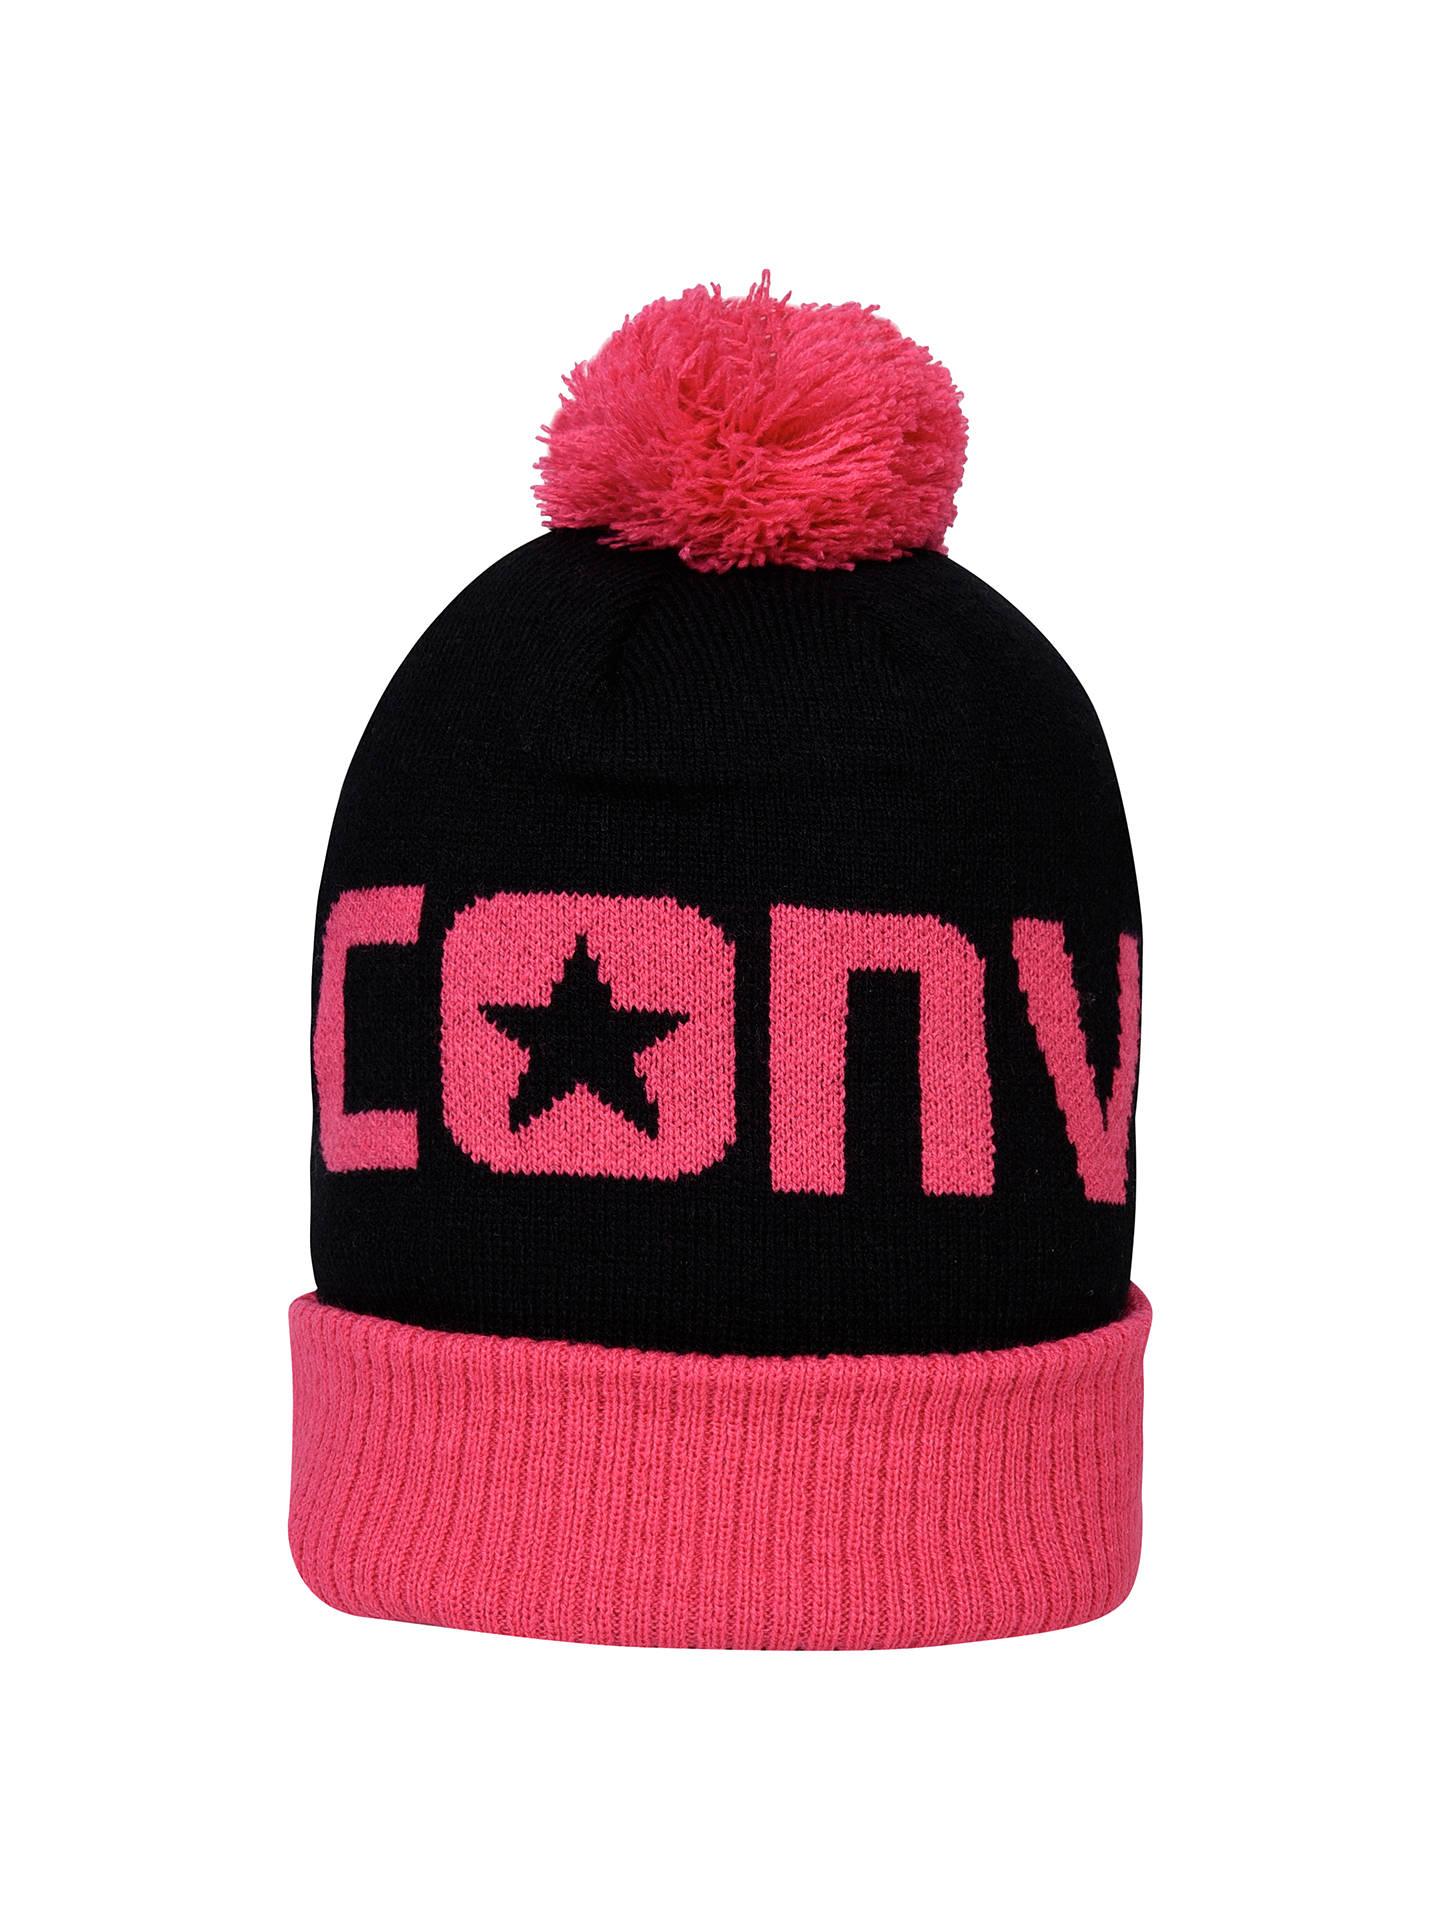 b2c099cf0a1d Buy Converse Children s Beanie Hat